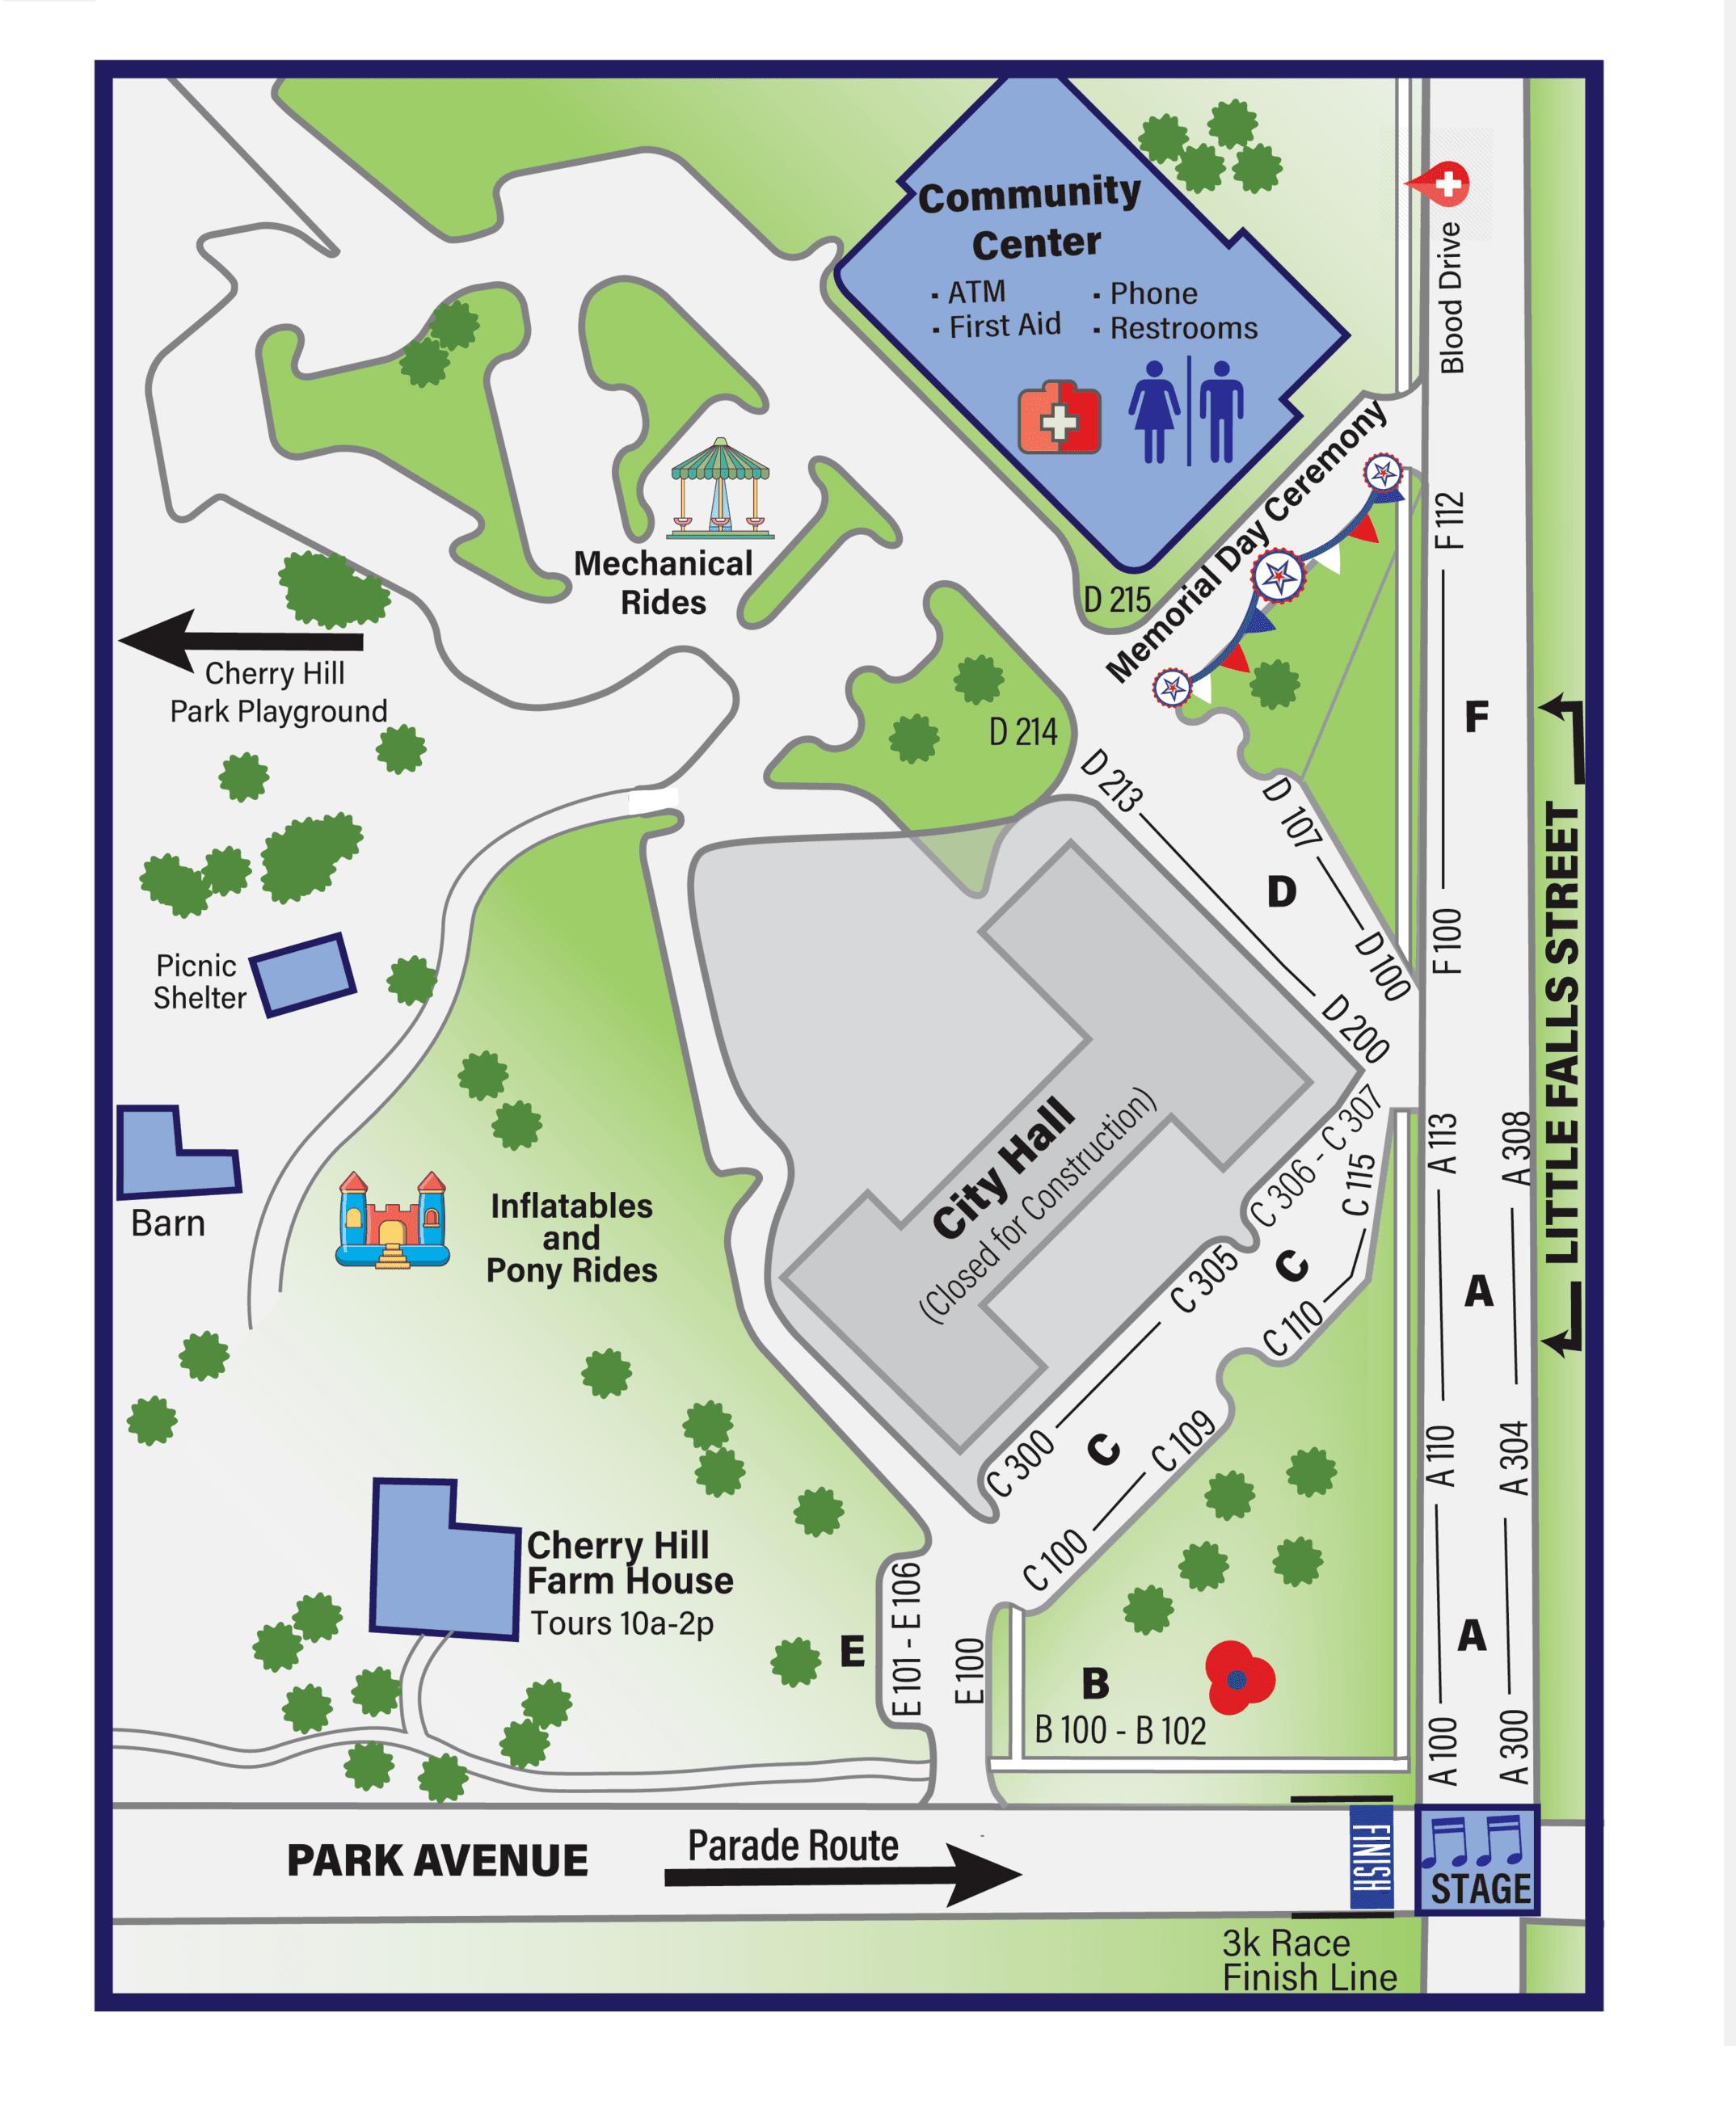 Falls Church Memorial Day Festival and Parade